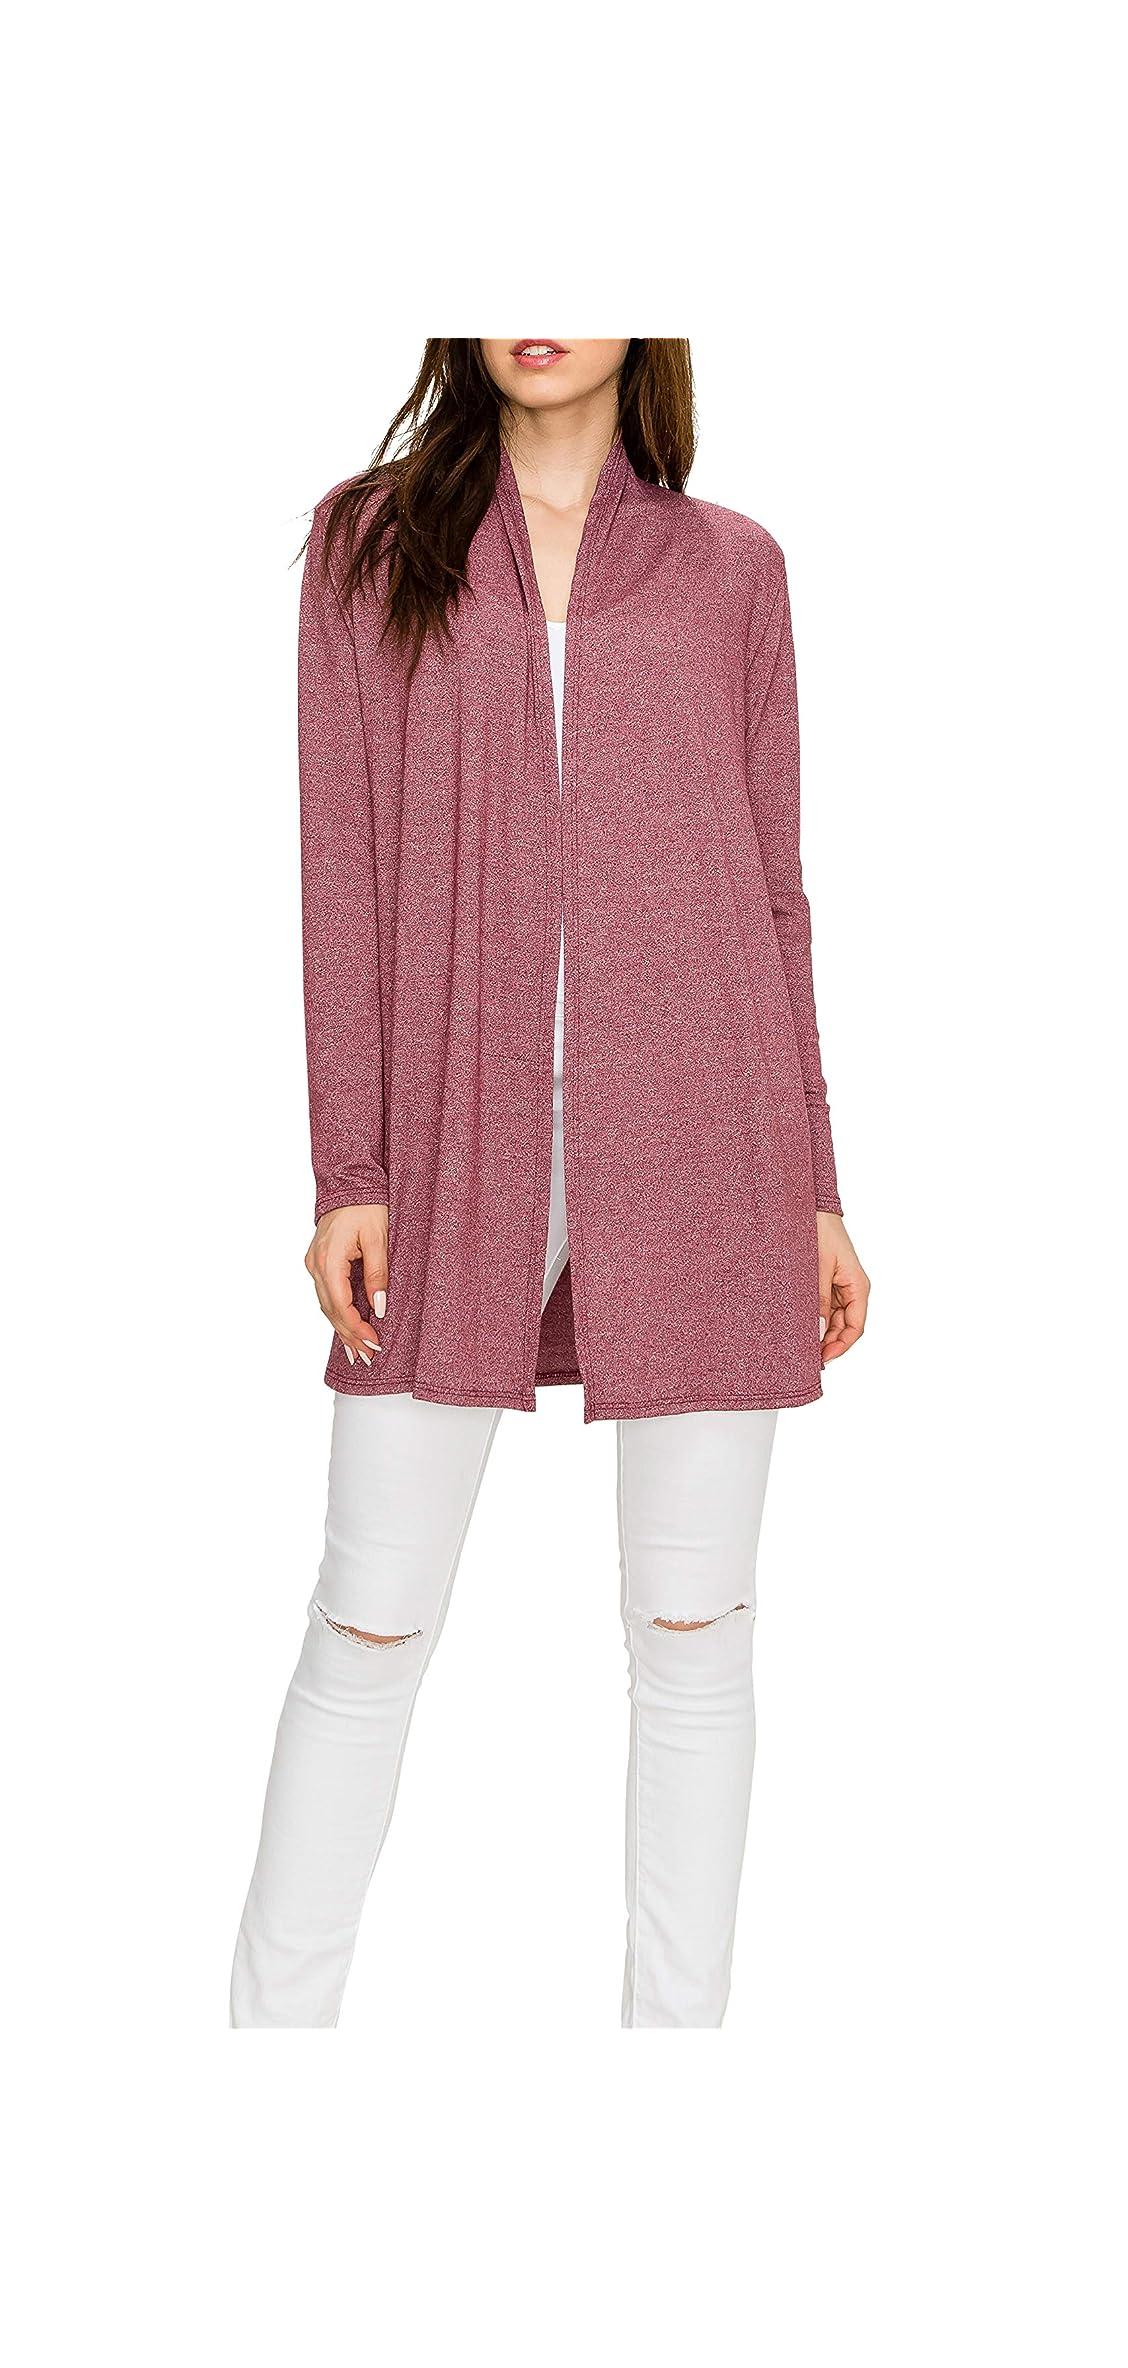 Long Lightweight Wrap Cardigans Sweaters Open Front